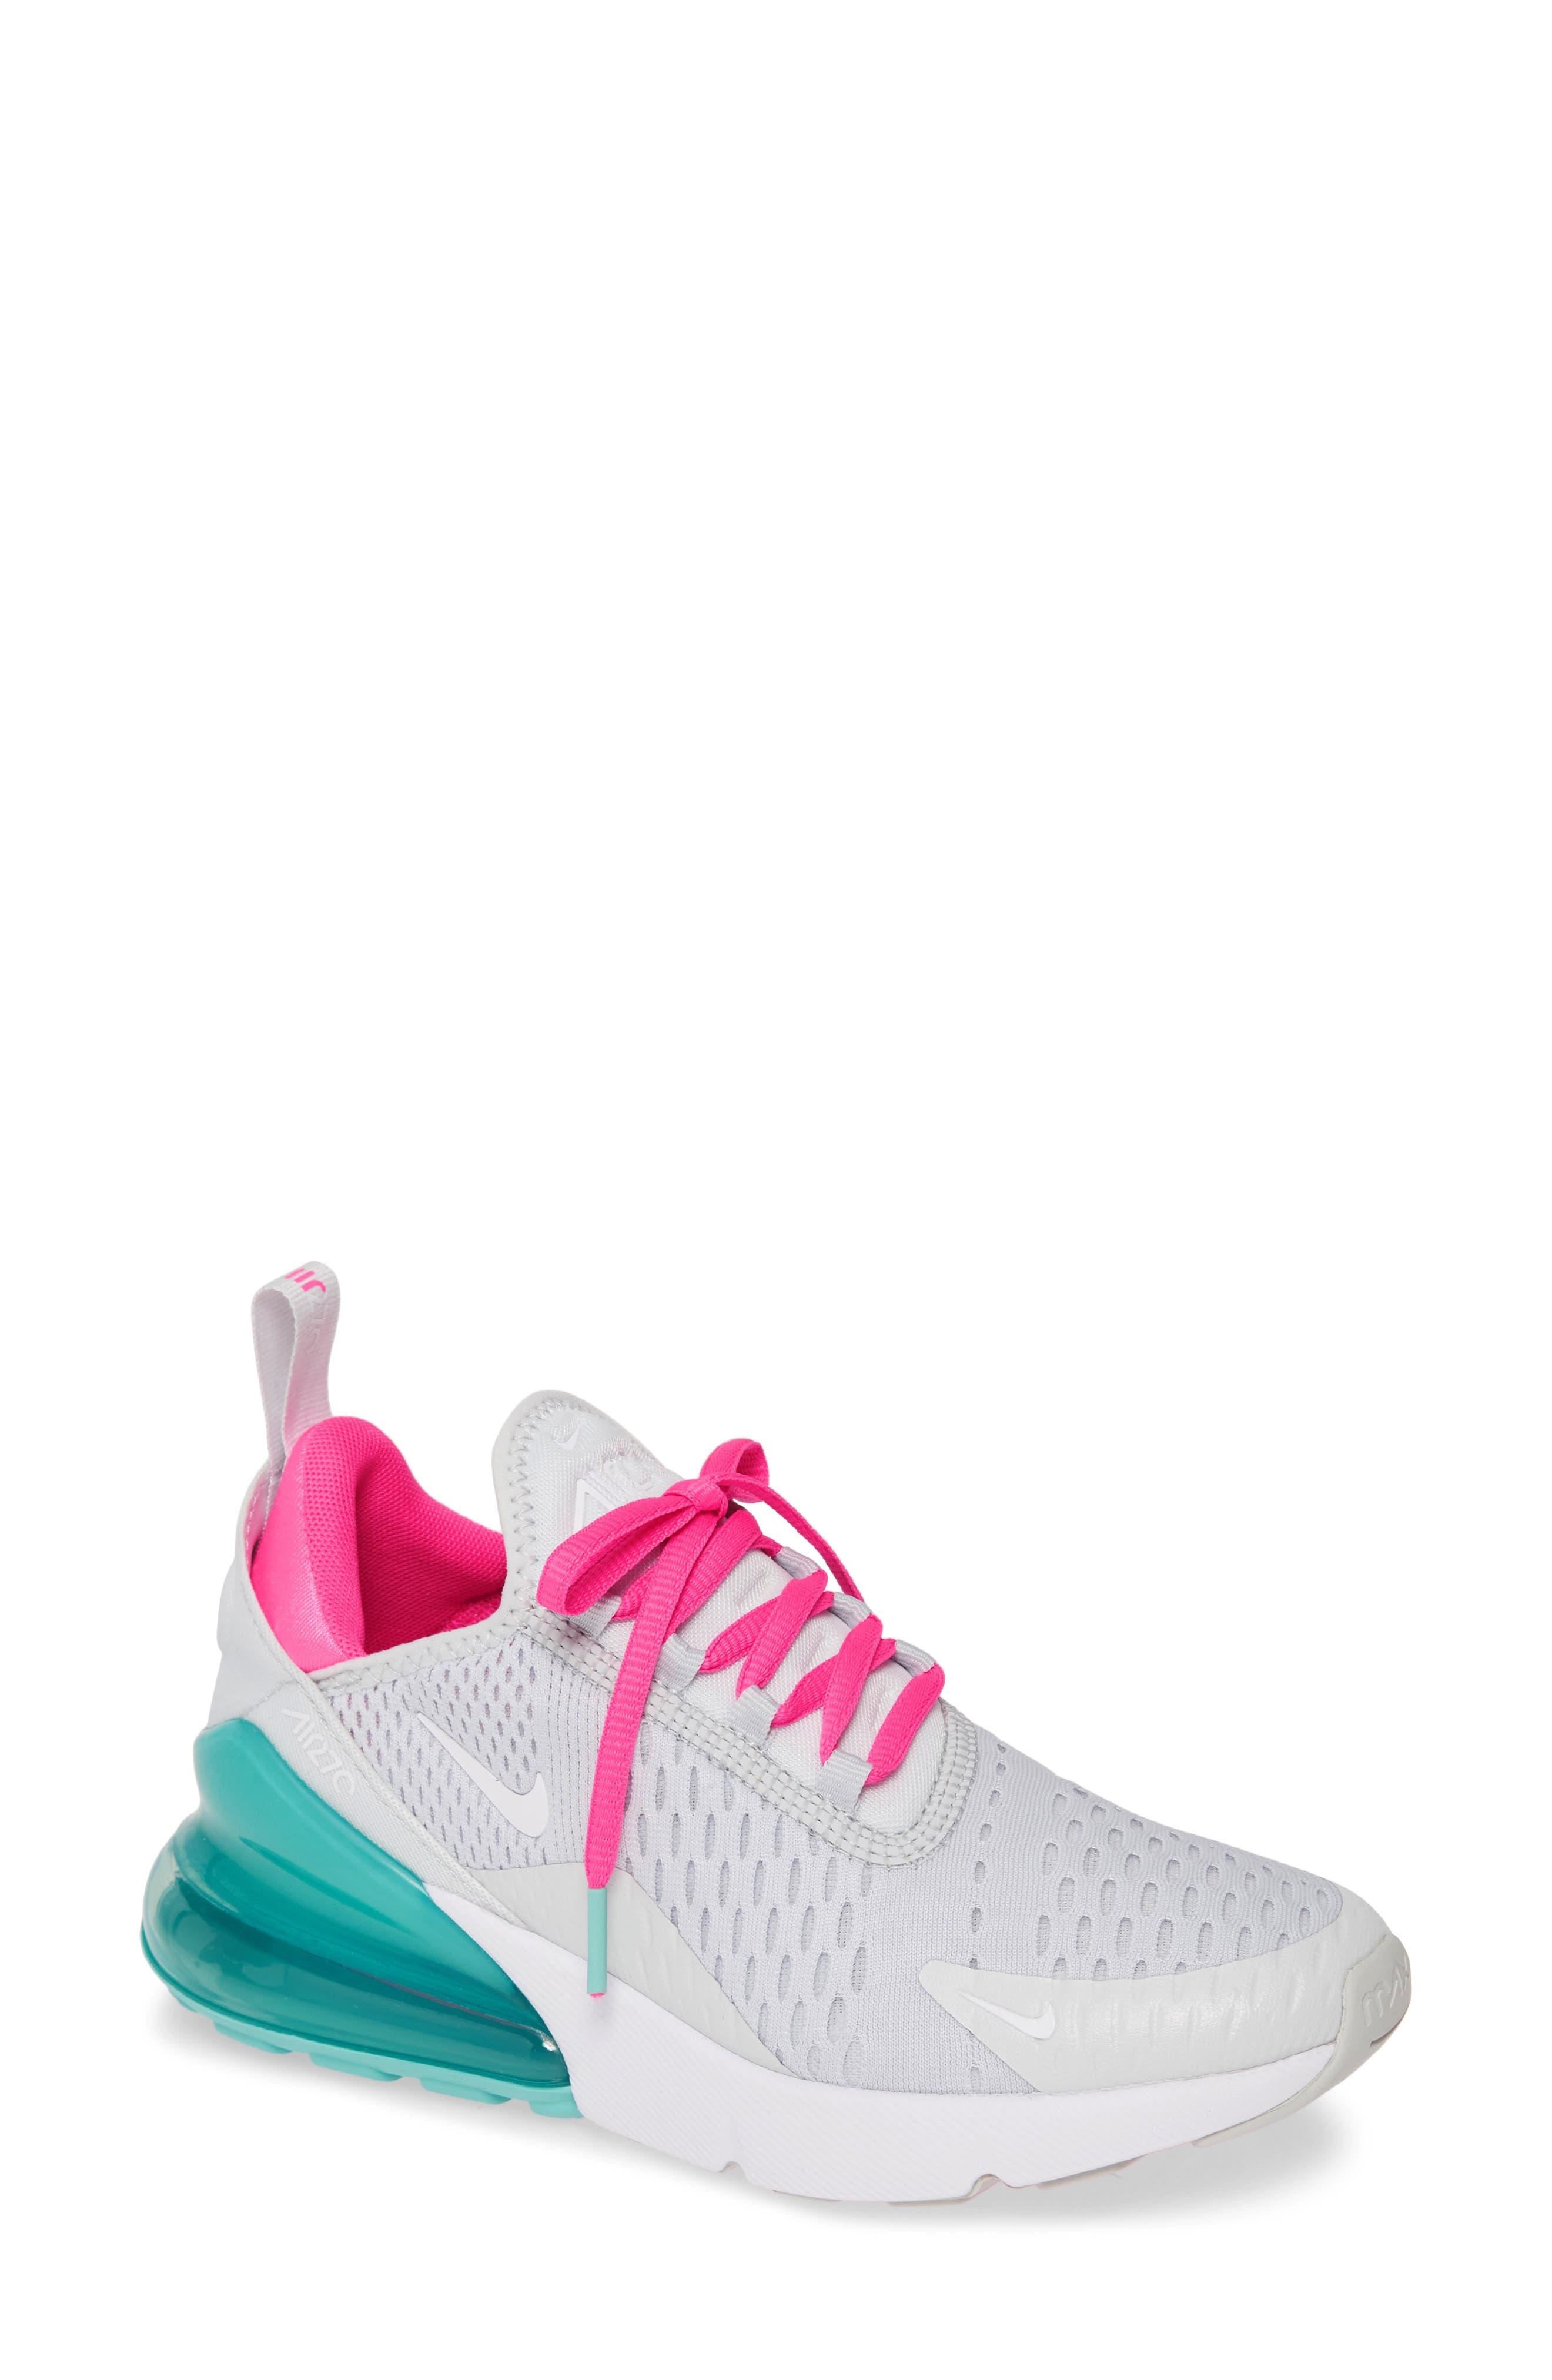 nike air max white pink